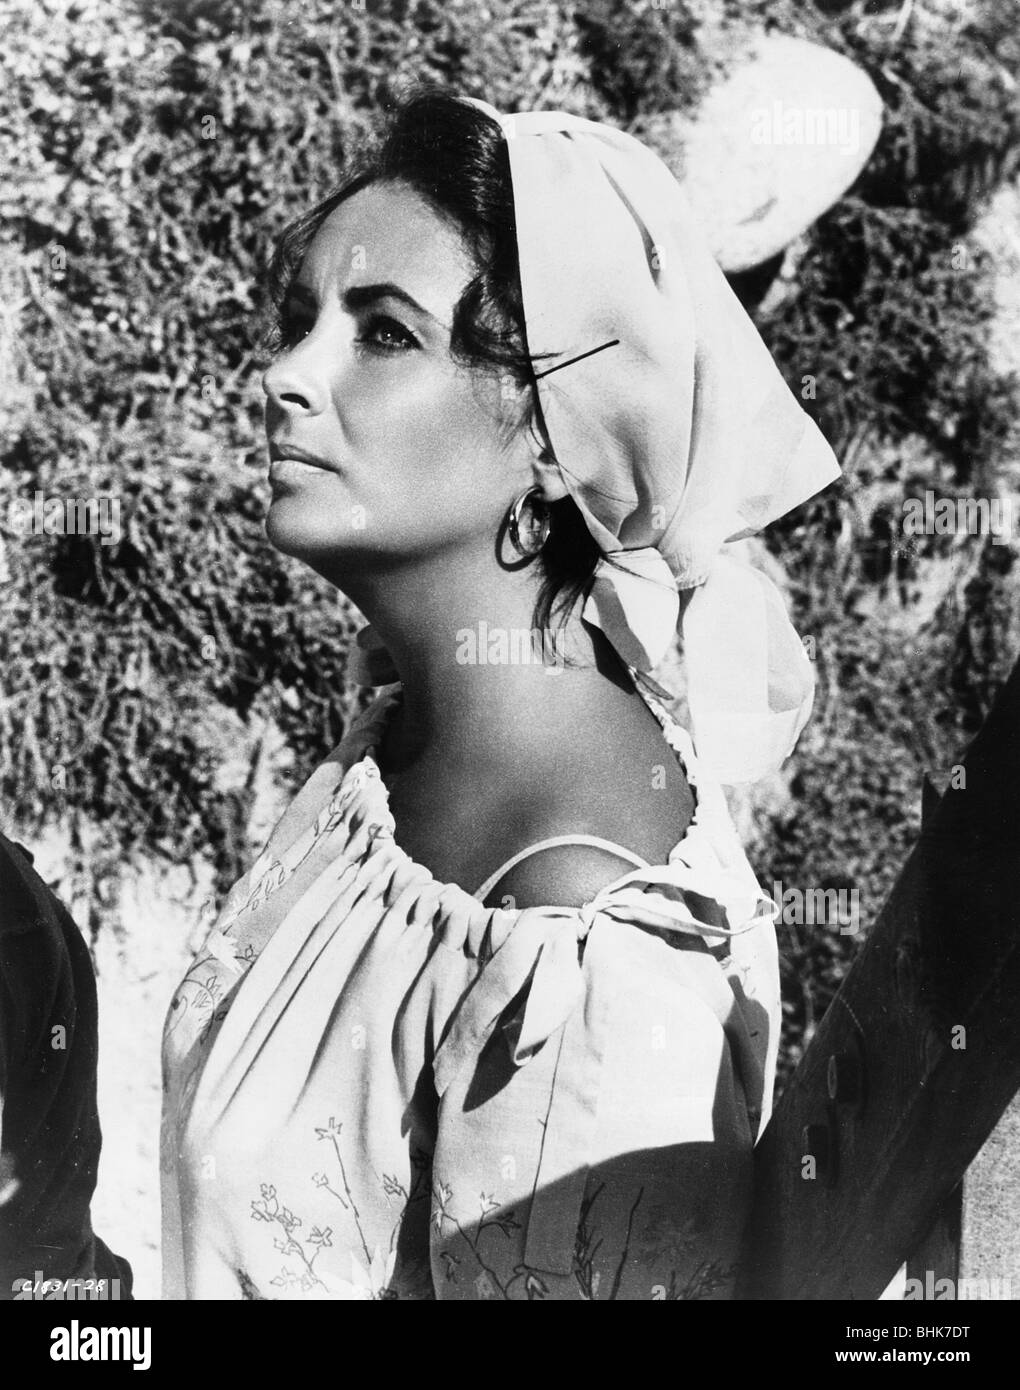 Elizabeth Taylor (1932-), British actress, 1965. Stock Photo